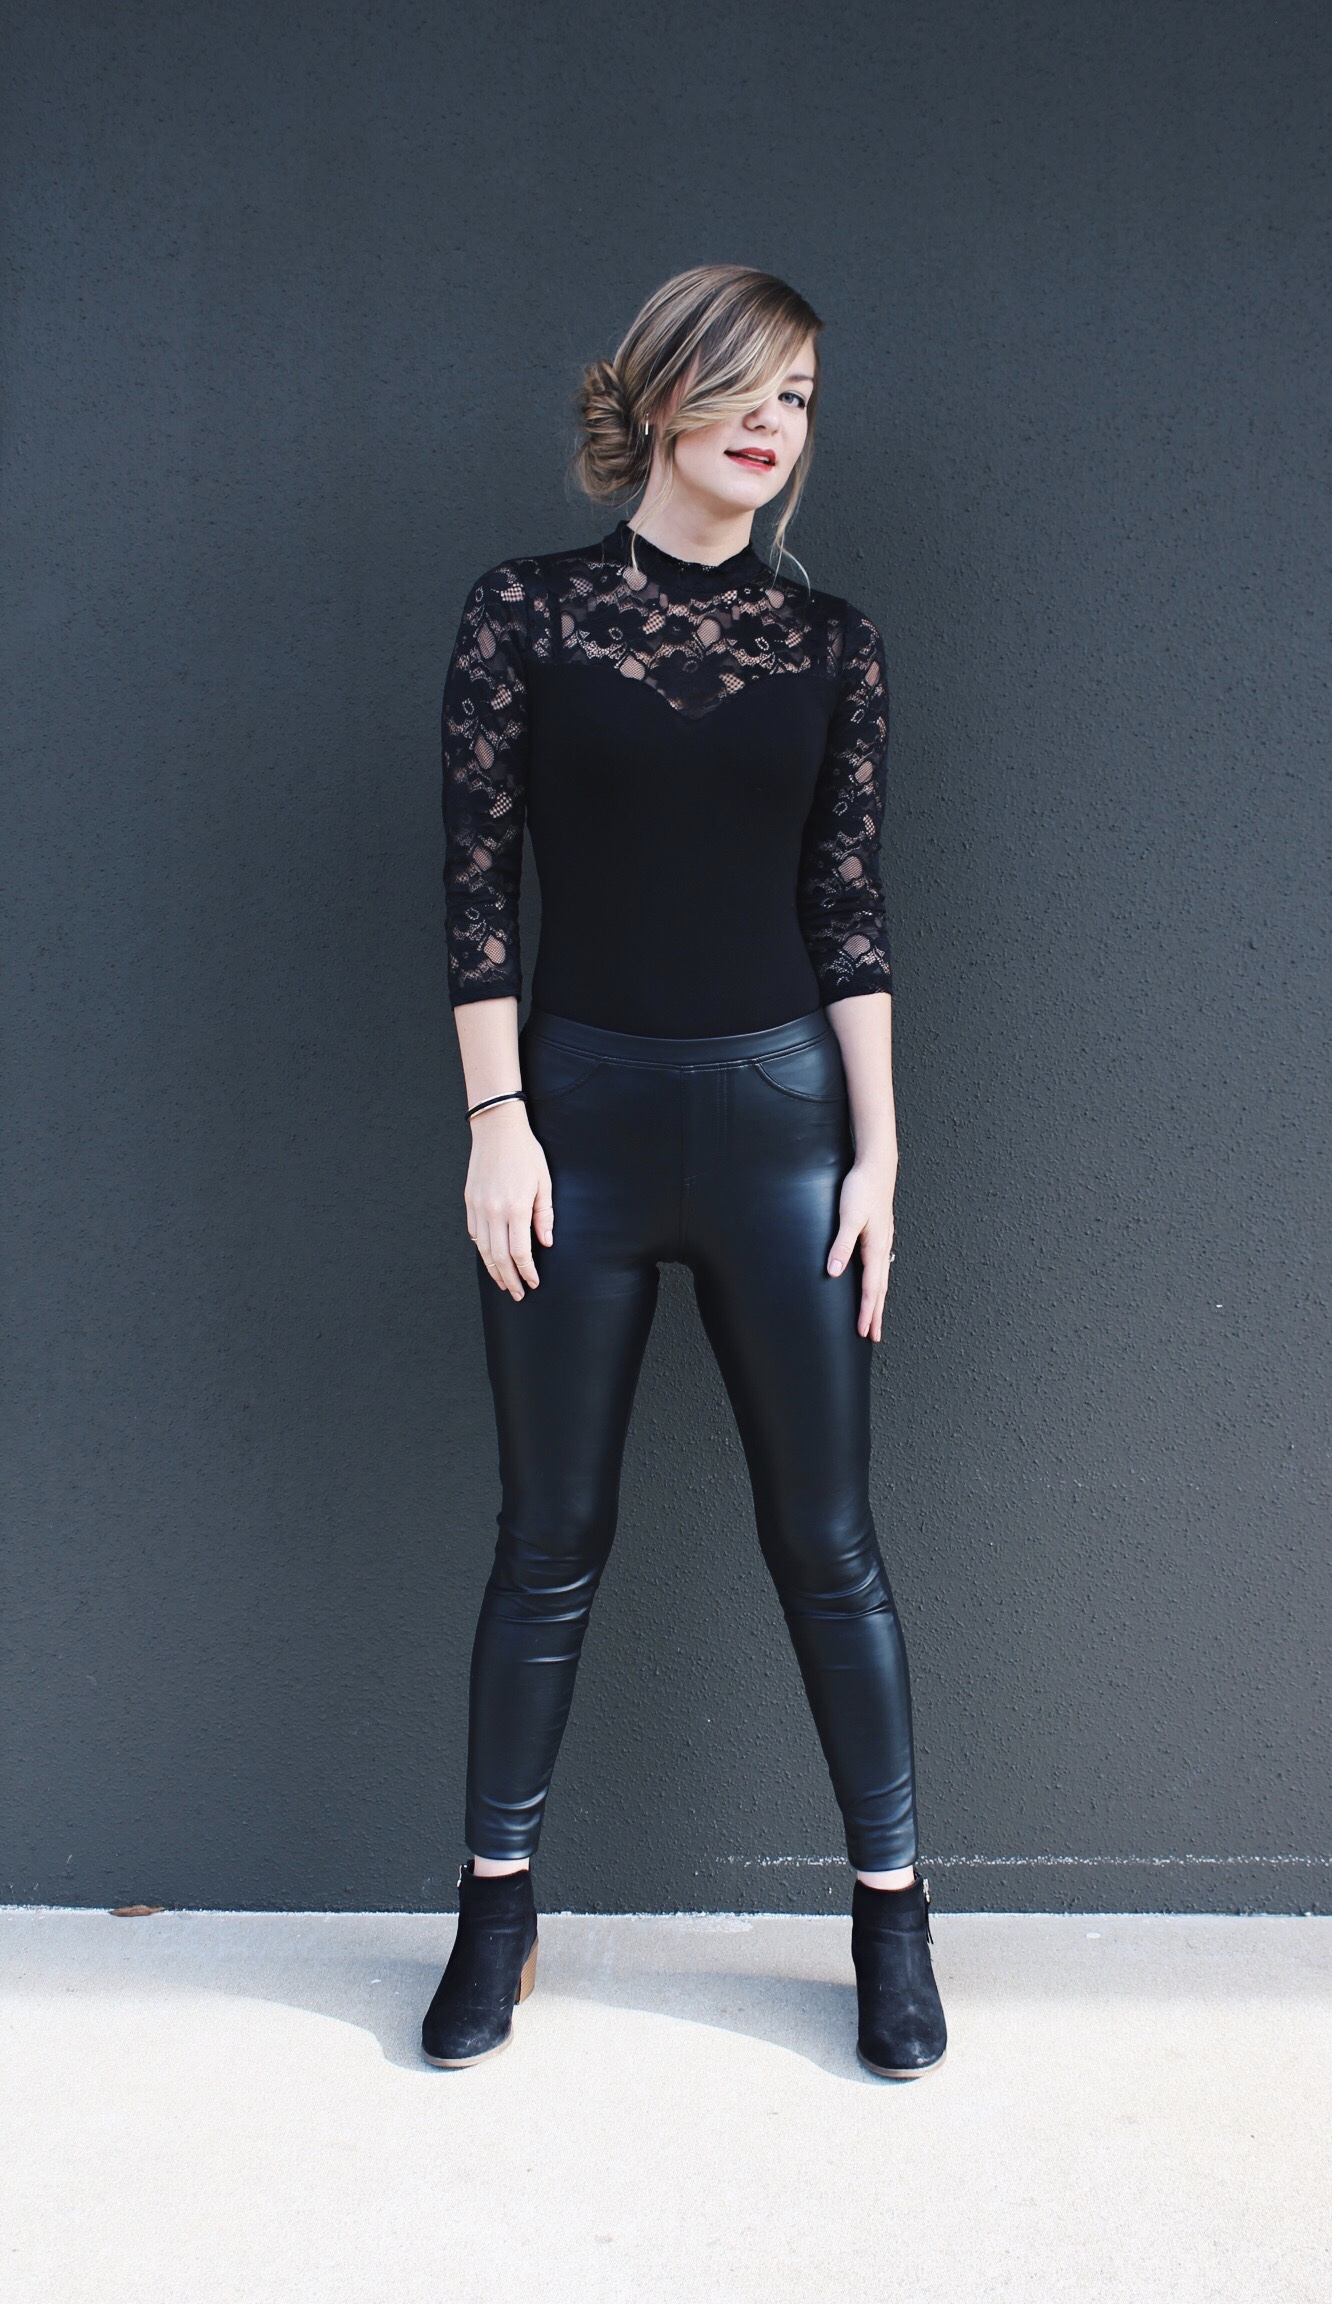 Side Up Do Bun & Black Lace Bodysuit